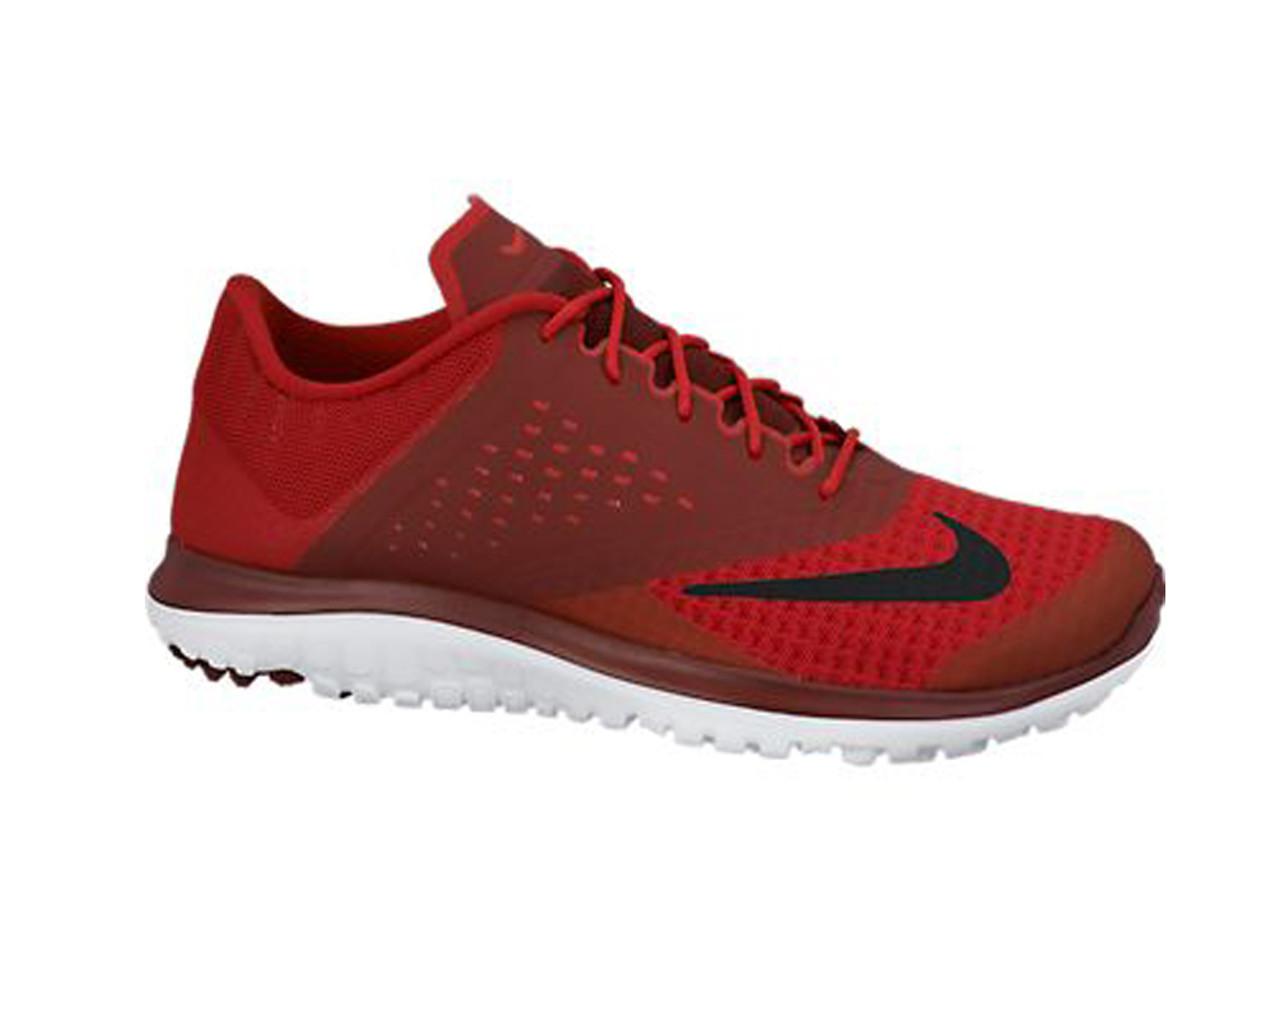 best sneakers e1f5b ae8bf Nike Men s FS Lite Run 2 Running Shoes Red Black - Shop now   Shoolu